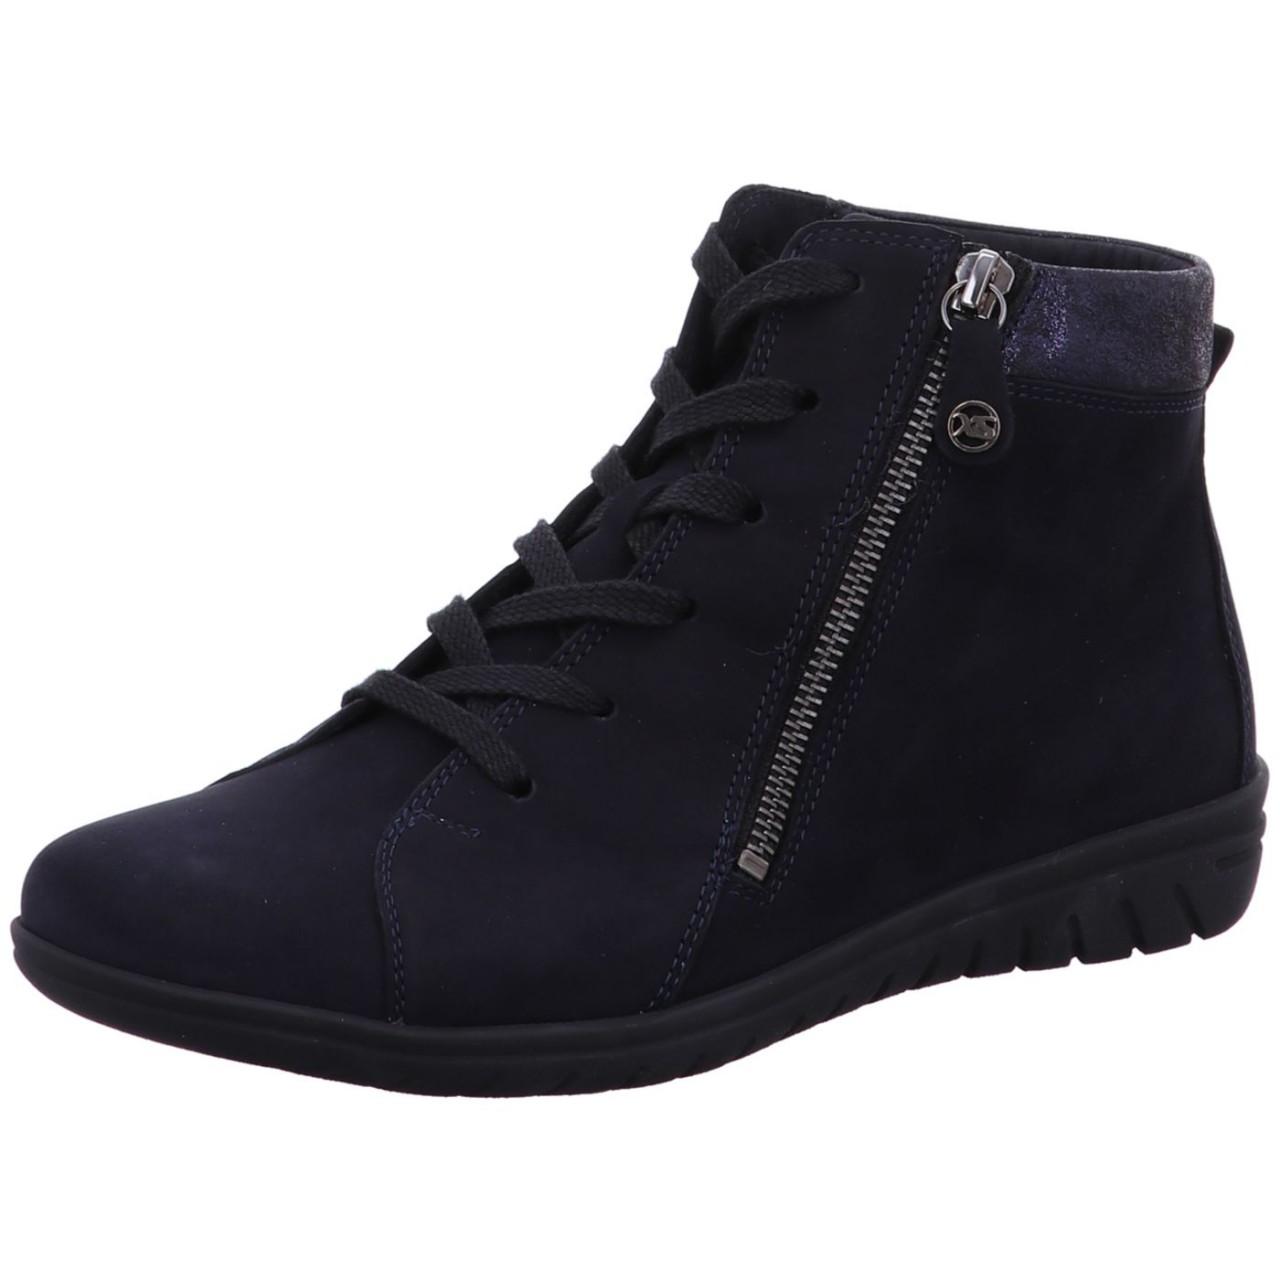 Hartjes Boot XS Casual Blau 81072-47,47